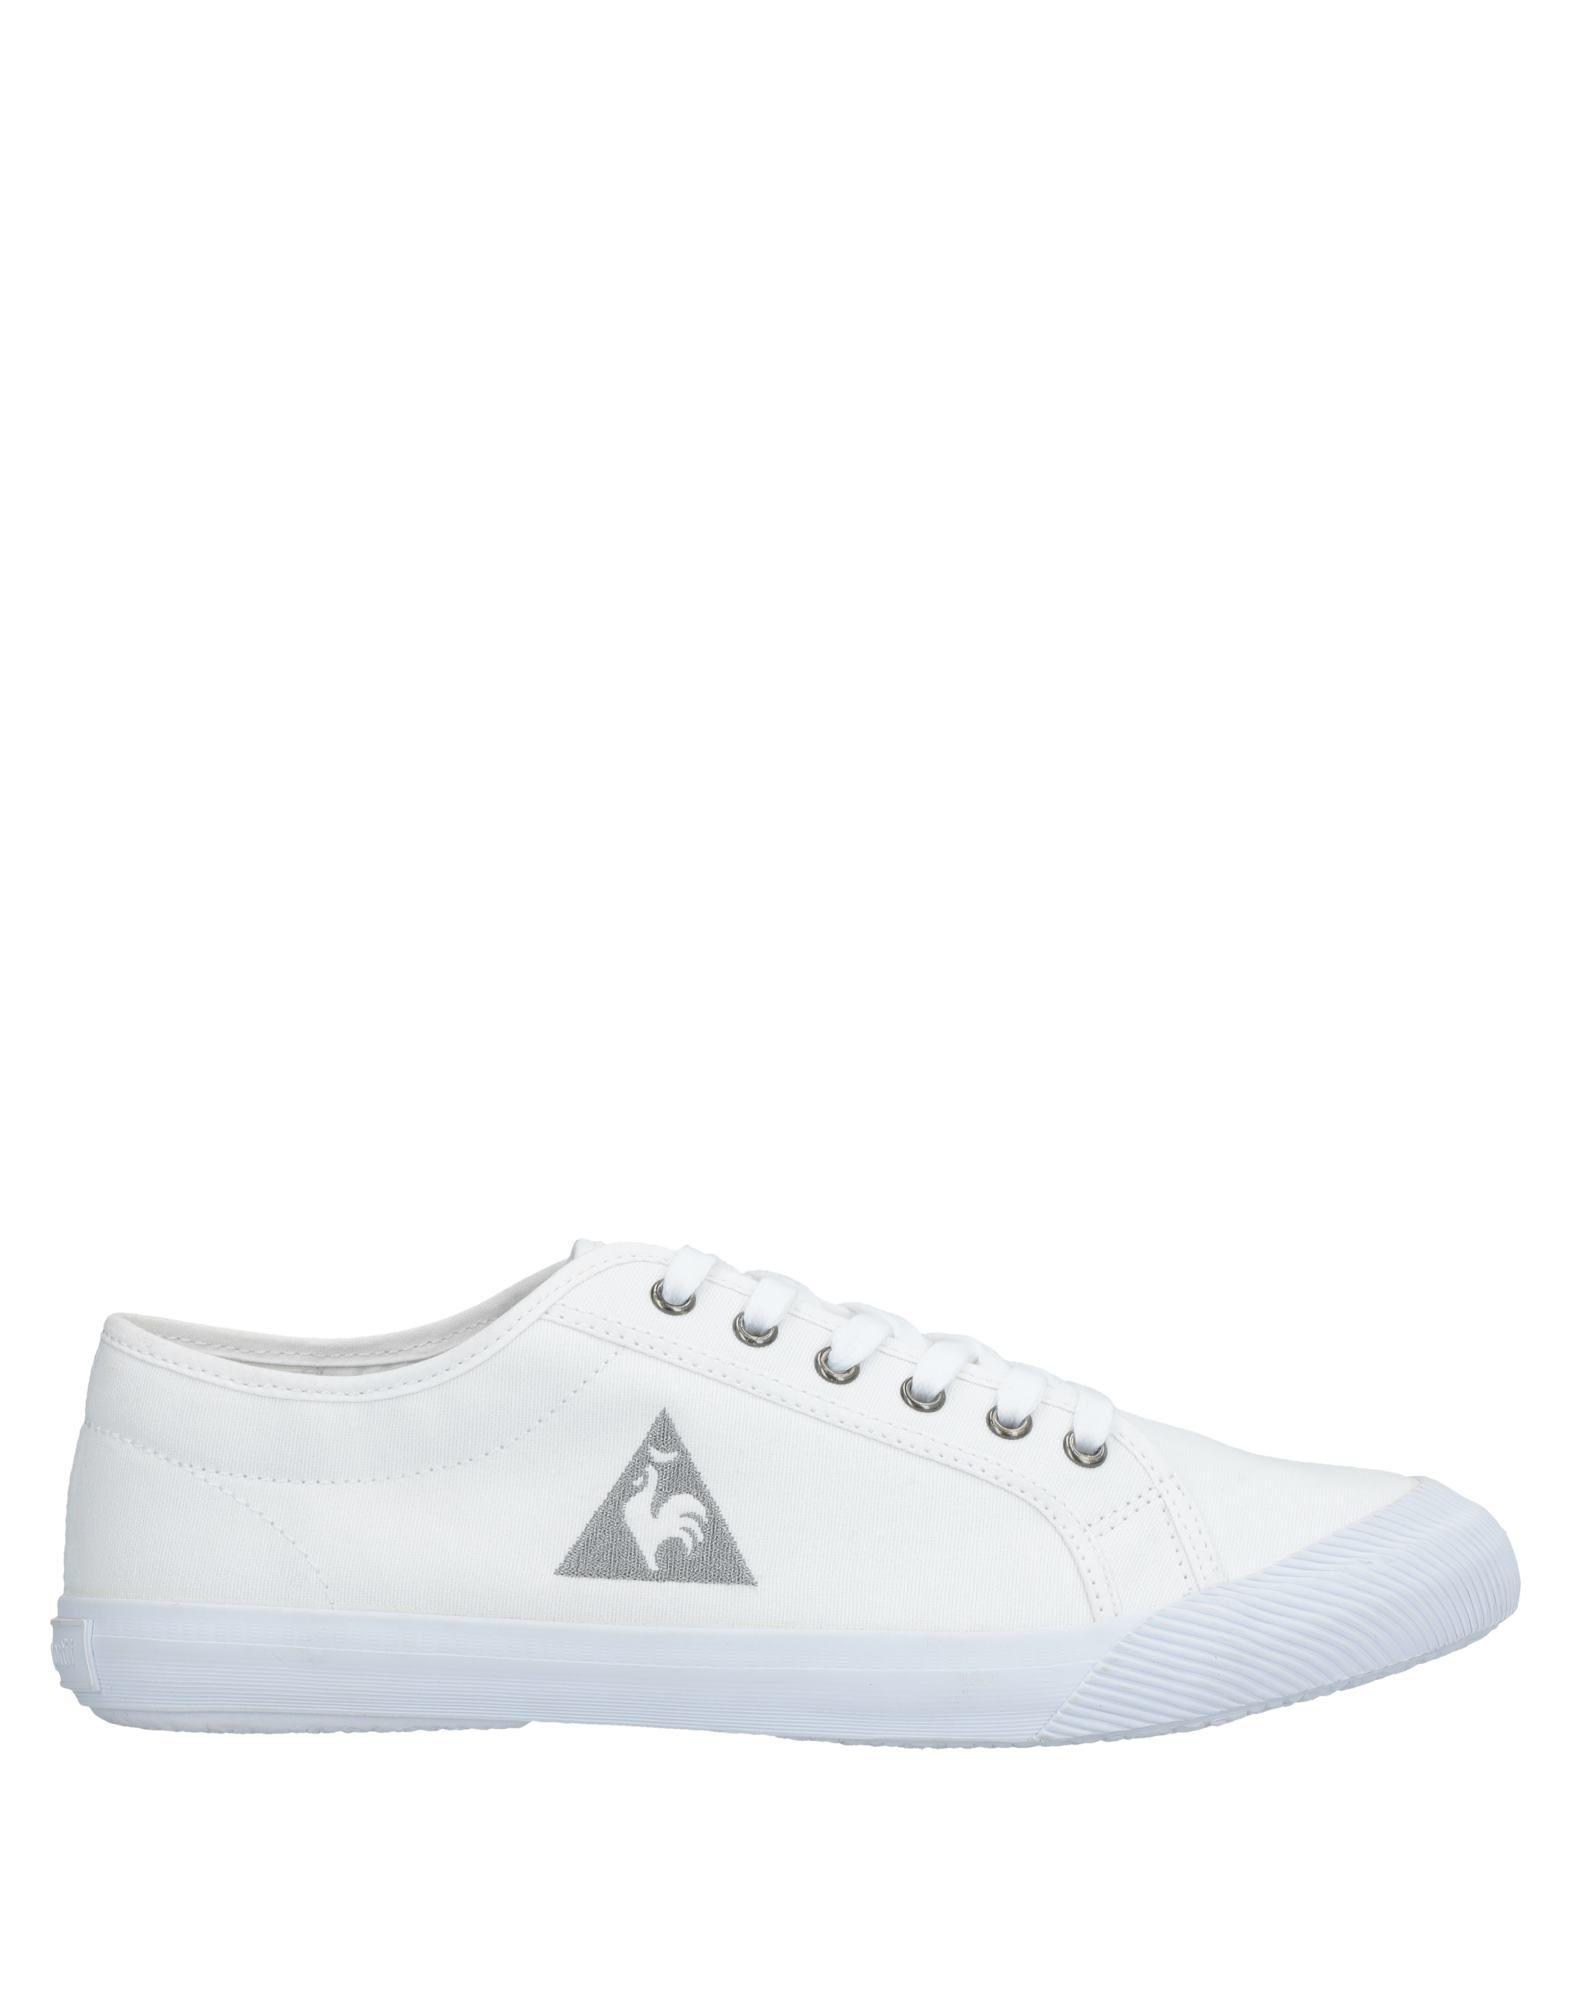 Sneakers Le Coq Sportif Uomo - 11534340FC